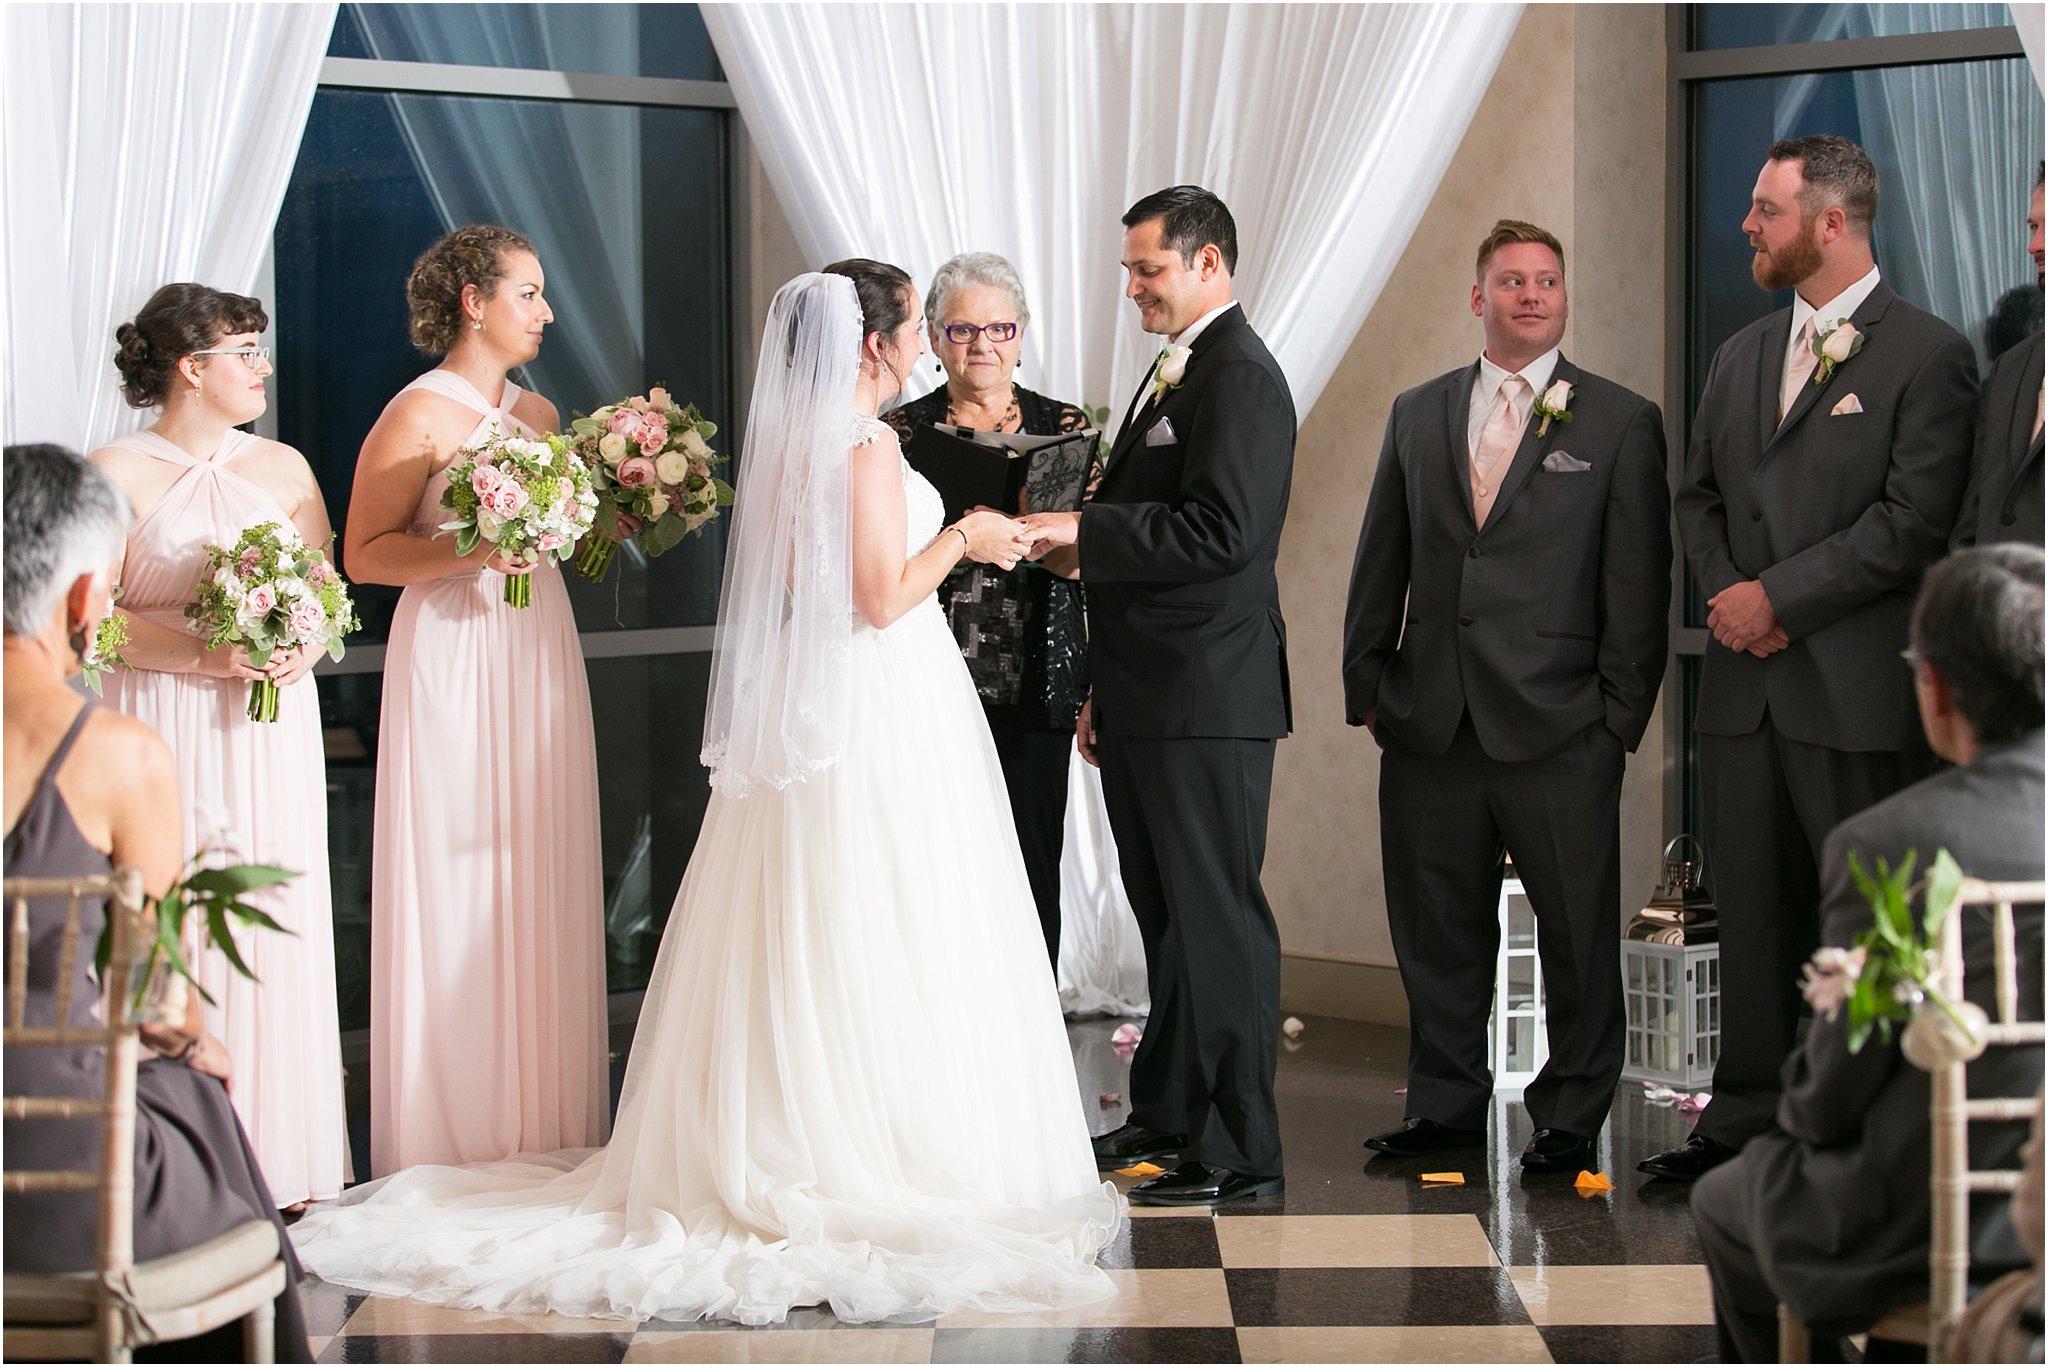 jessica_ryan_photography_virginia_wedding_photographer_wedding_hurricane_norfolk_botanical_gardens_hurricane_matthew_wedding_3594